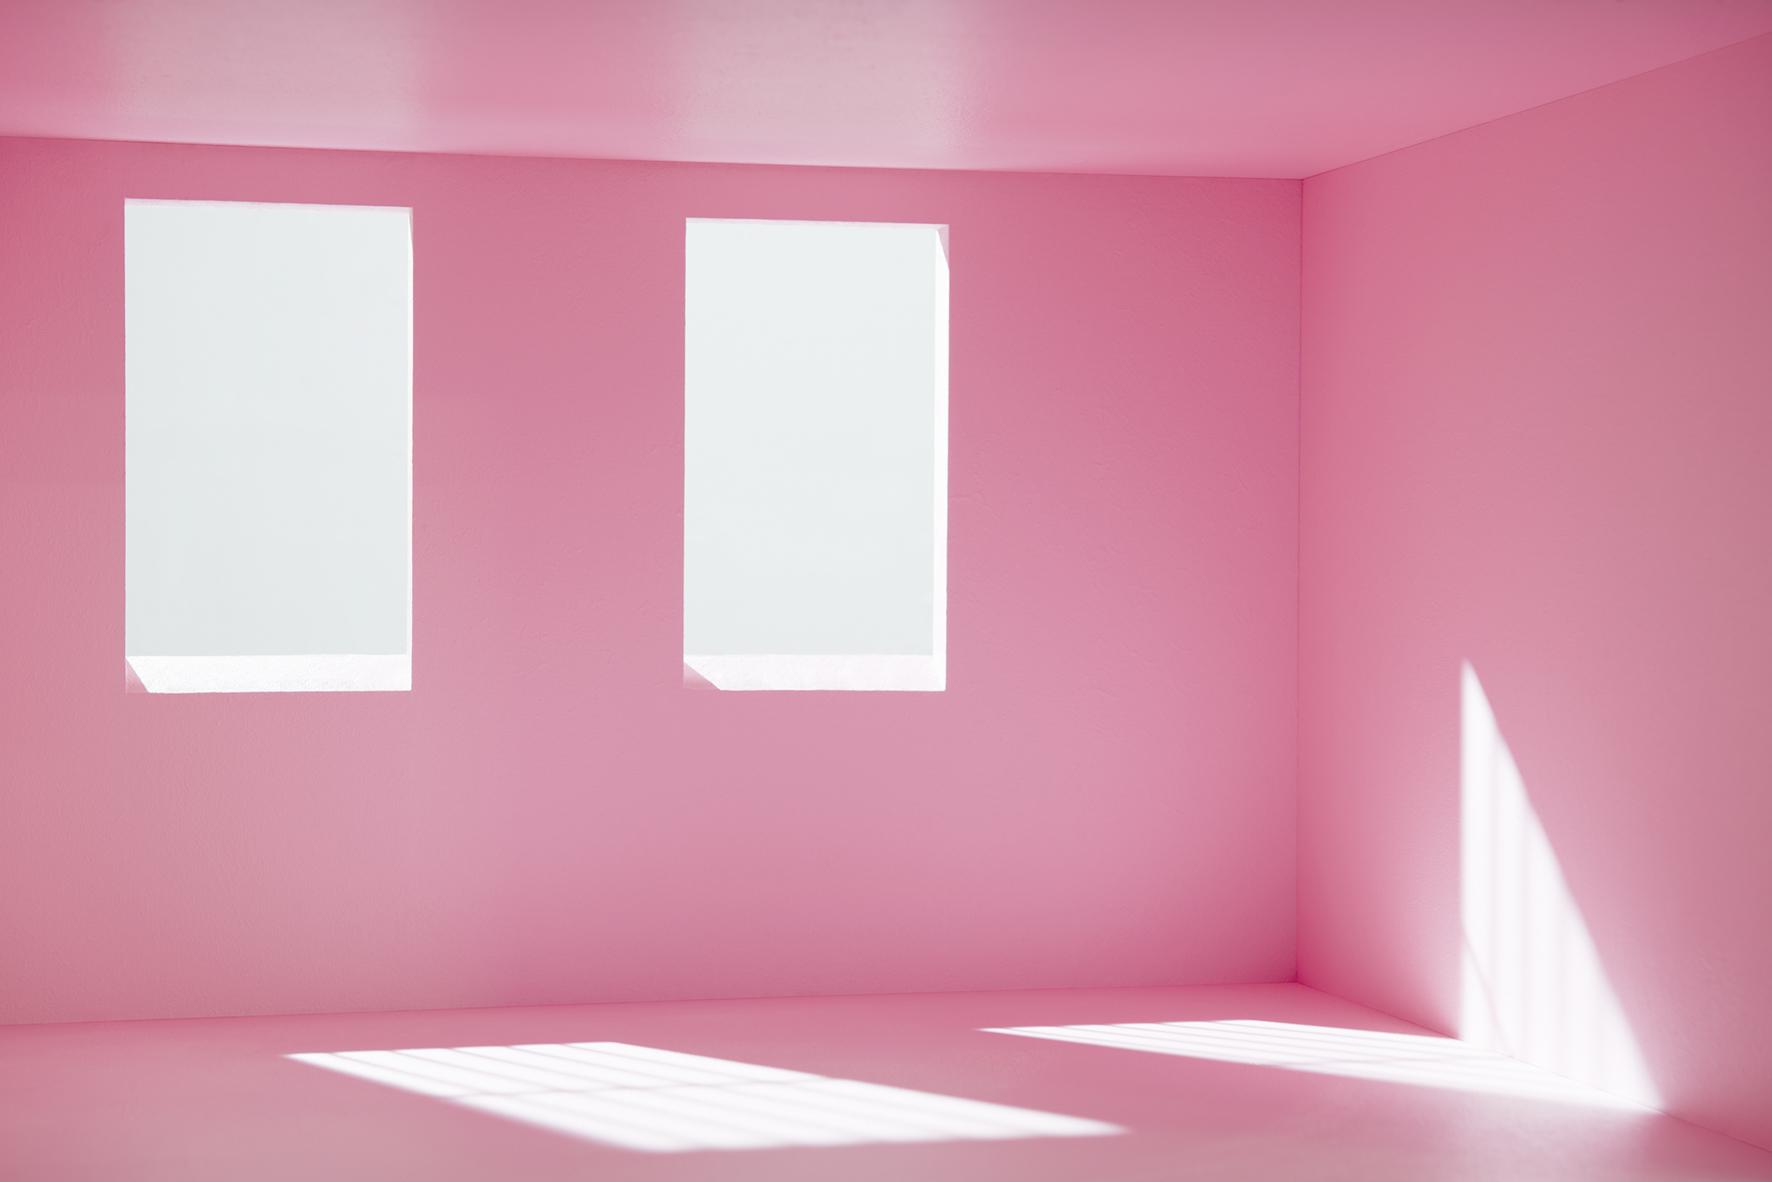 Image of Waiting Room to Wonderland